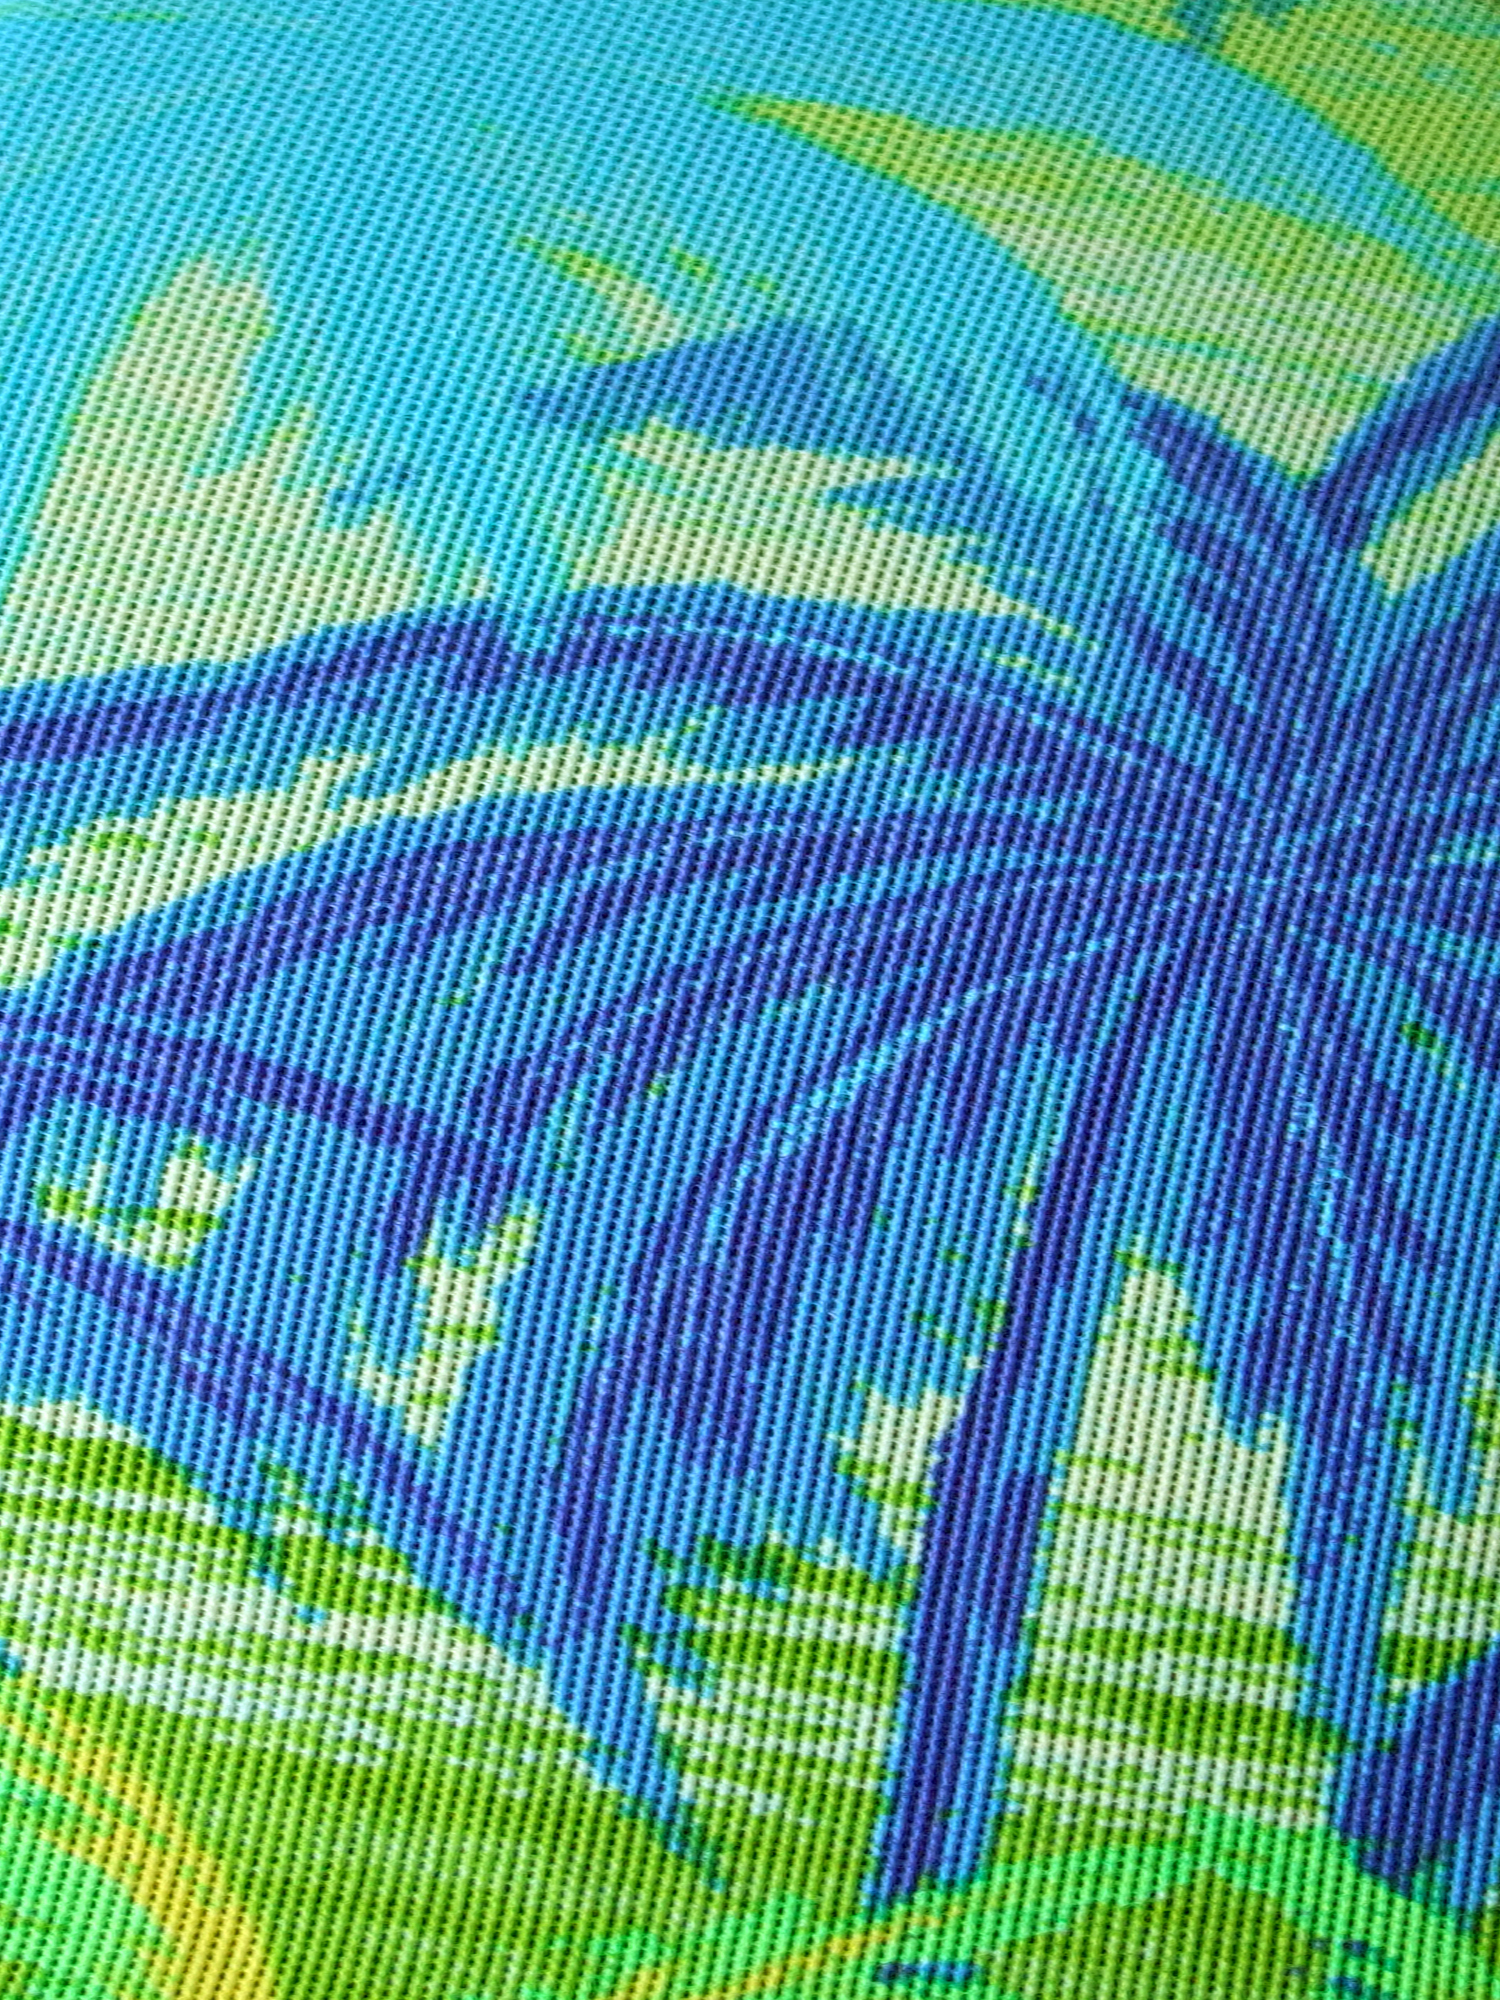 41a6ab50009266 ... Vorschau: Badeanzug durchbäunend sportlich Gr. 46 B-Cup Palmen in grün